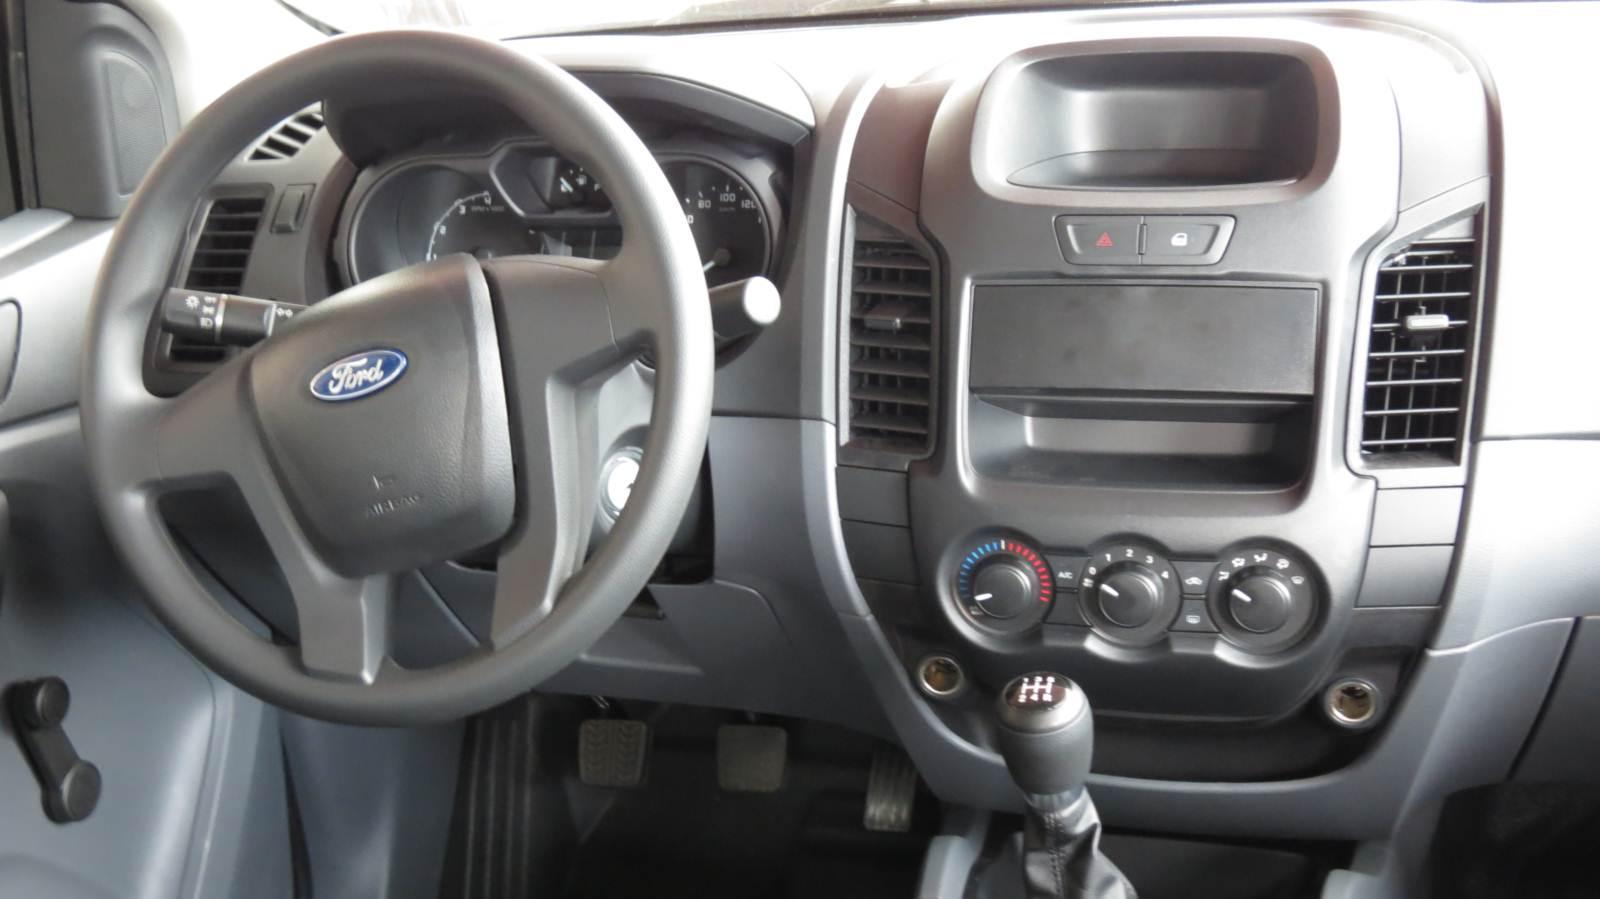 Ford Ranger XL 2.5 Flex Cabine Dupla - painel